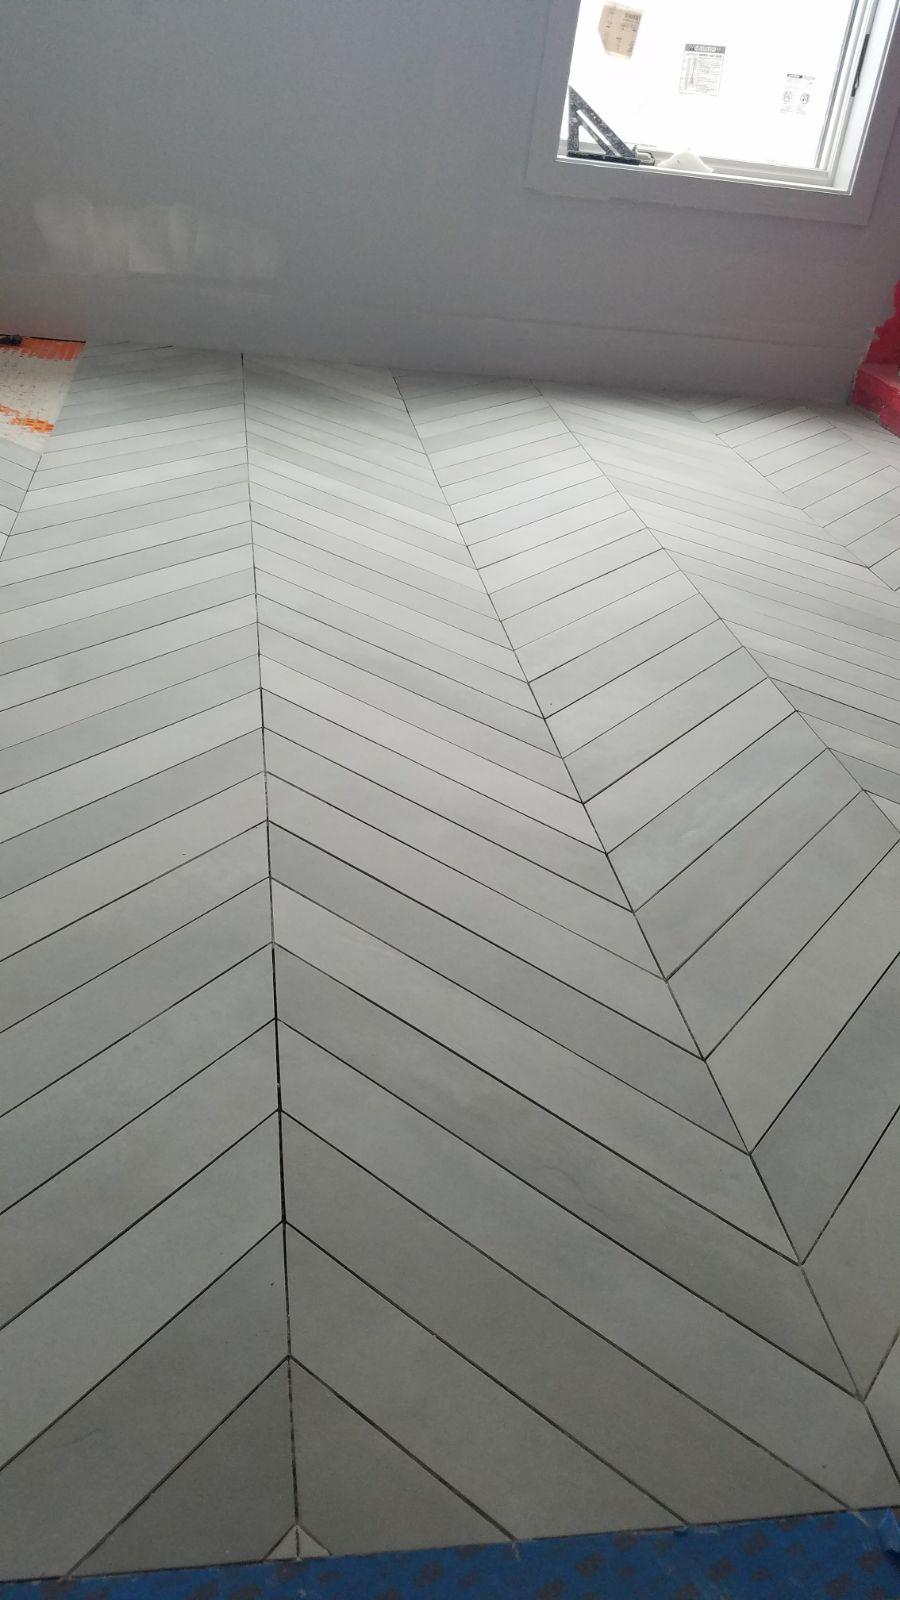 Floor 8.19.31 PM (1).jpeg